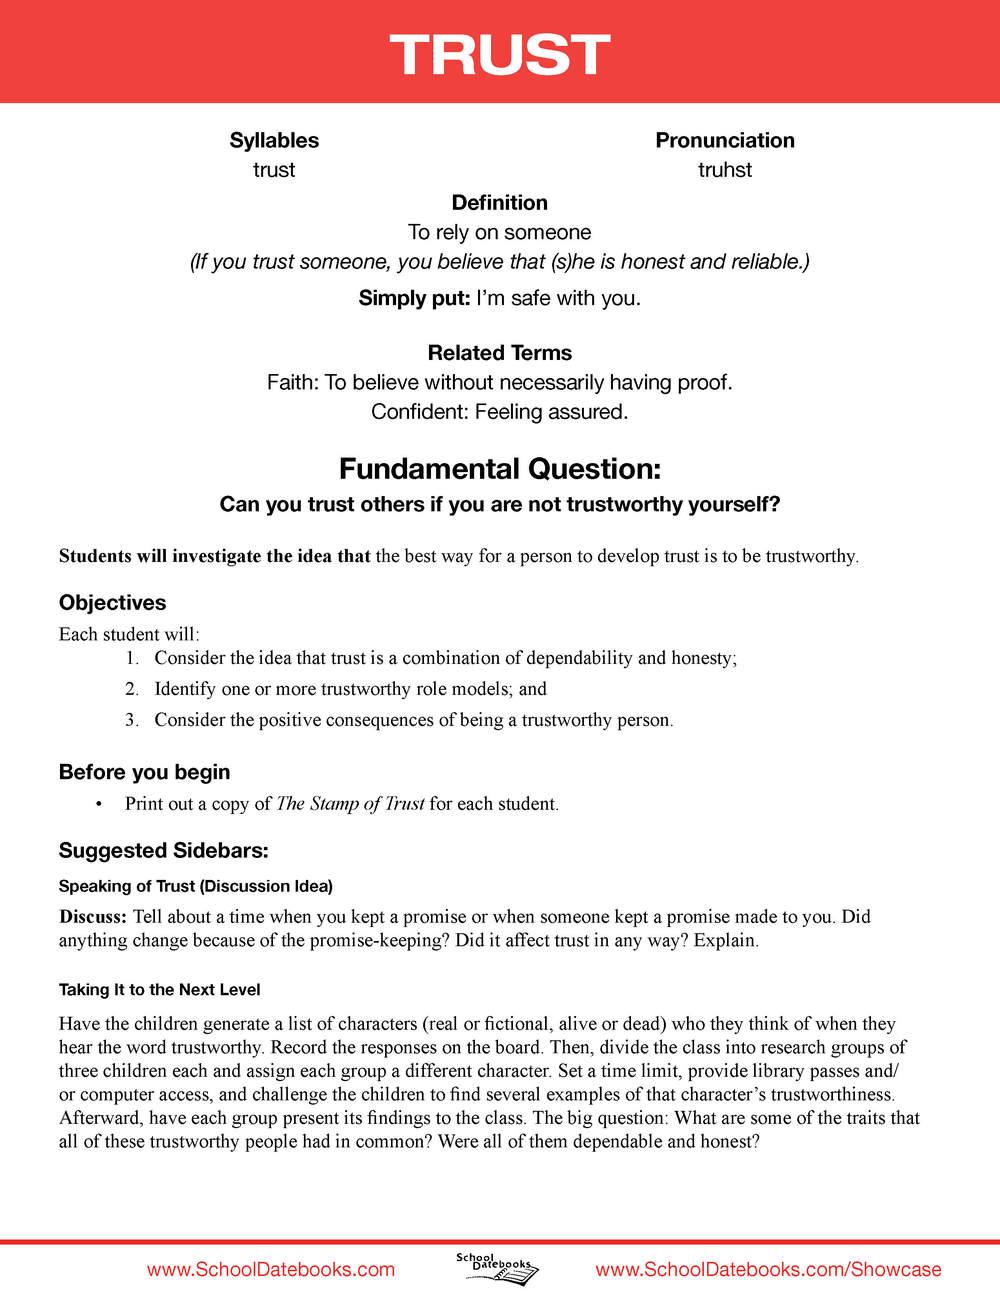 LessonPlan-Trust_Page_1.jpg